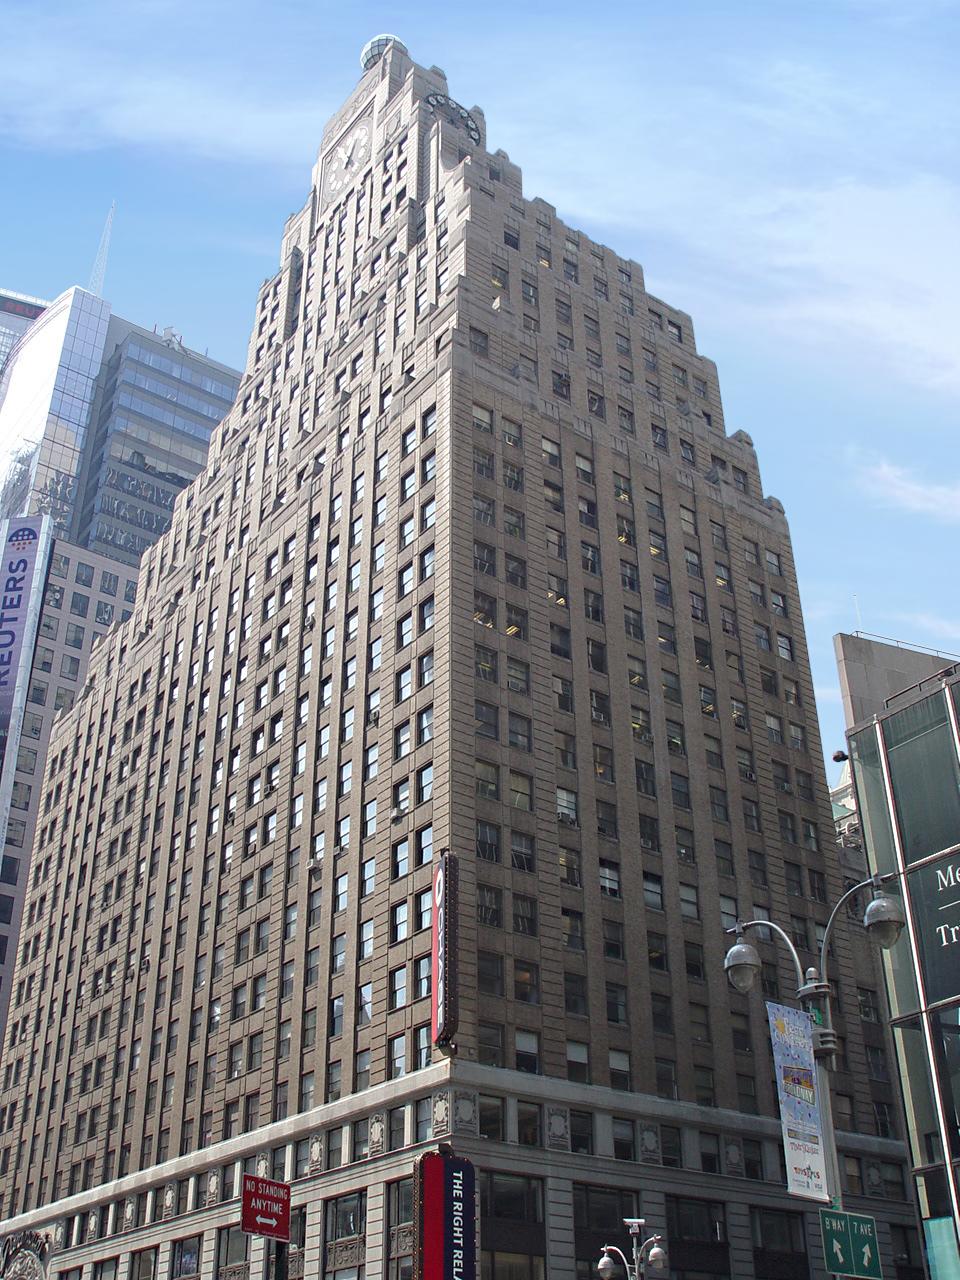 Times Square Hotel Concept. Tobin Parnes Design. NYC. Hospitality Design. Exterior.